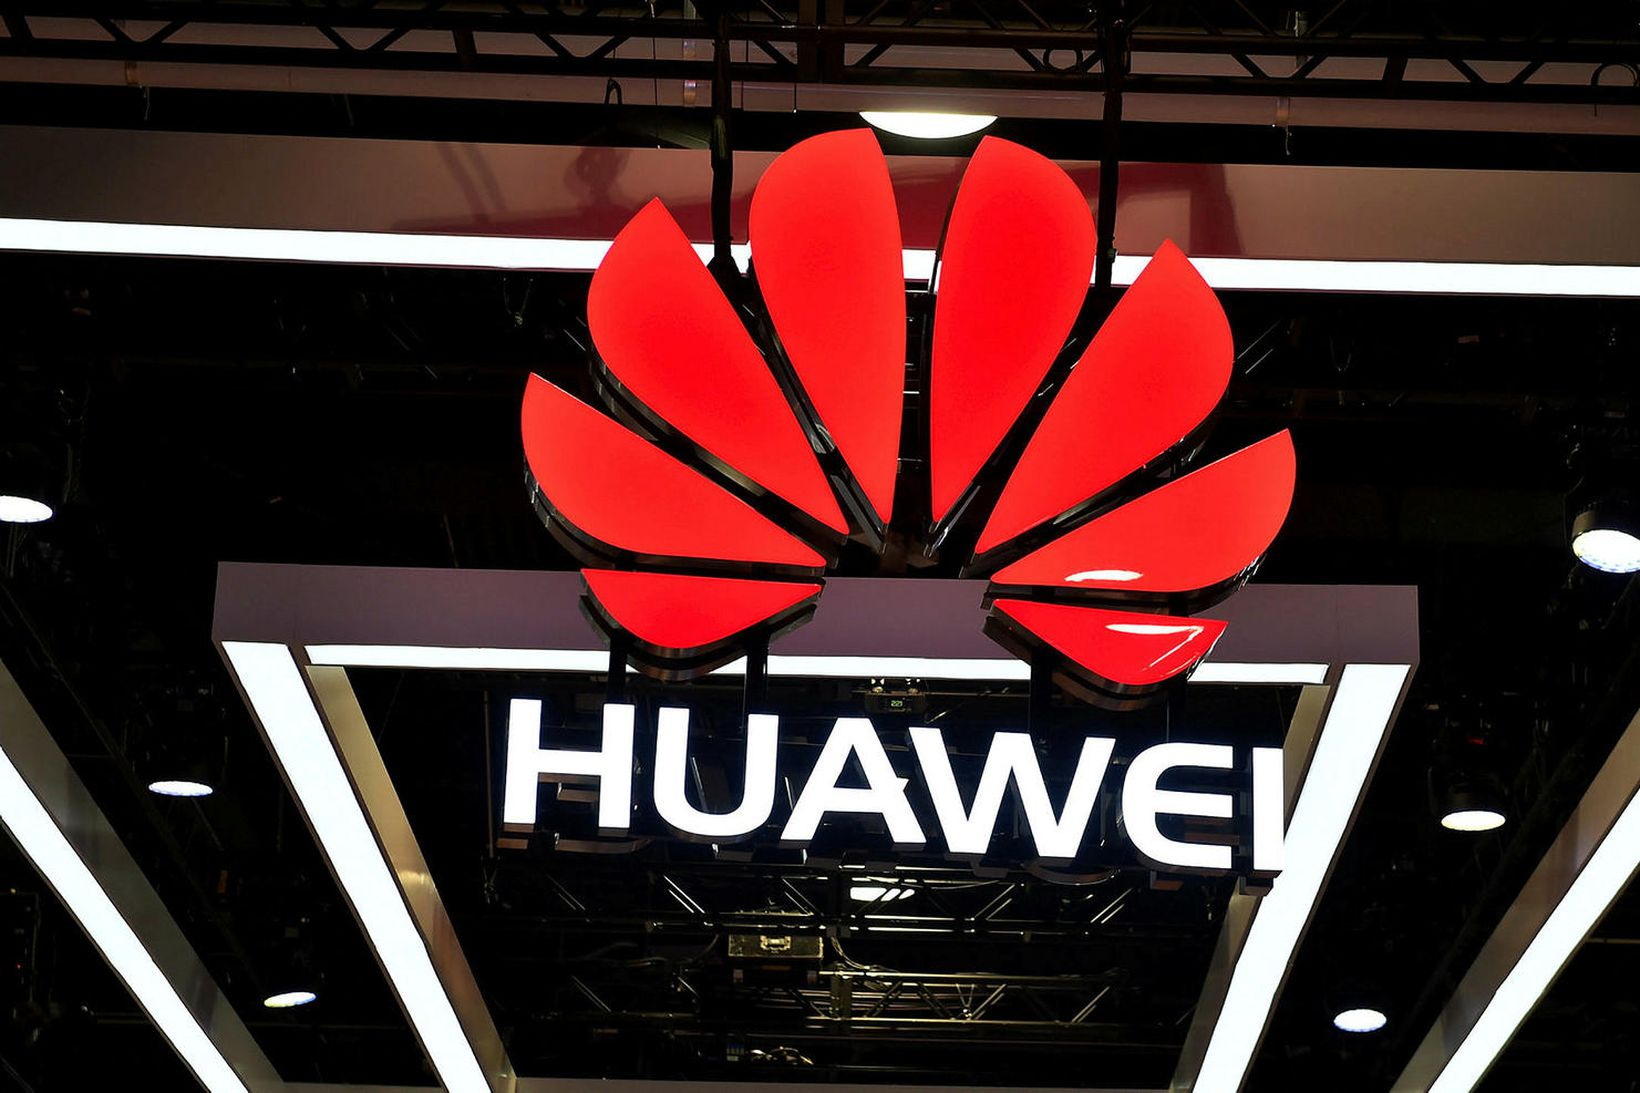 Velta Huawei risans eykst ár frá ári.